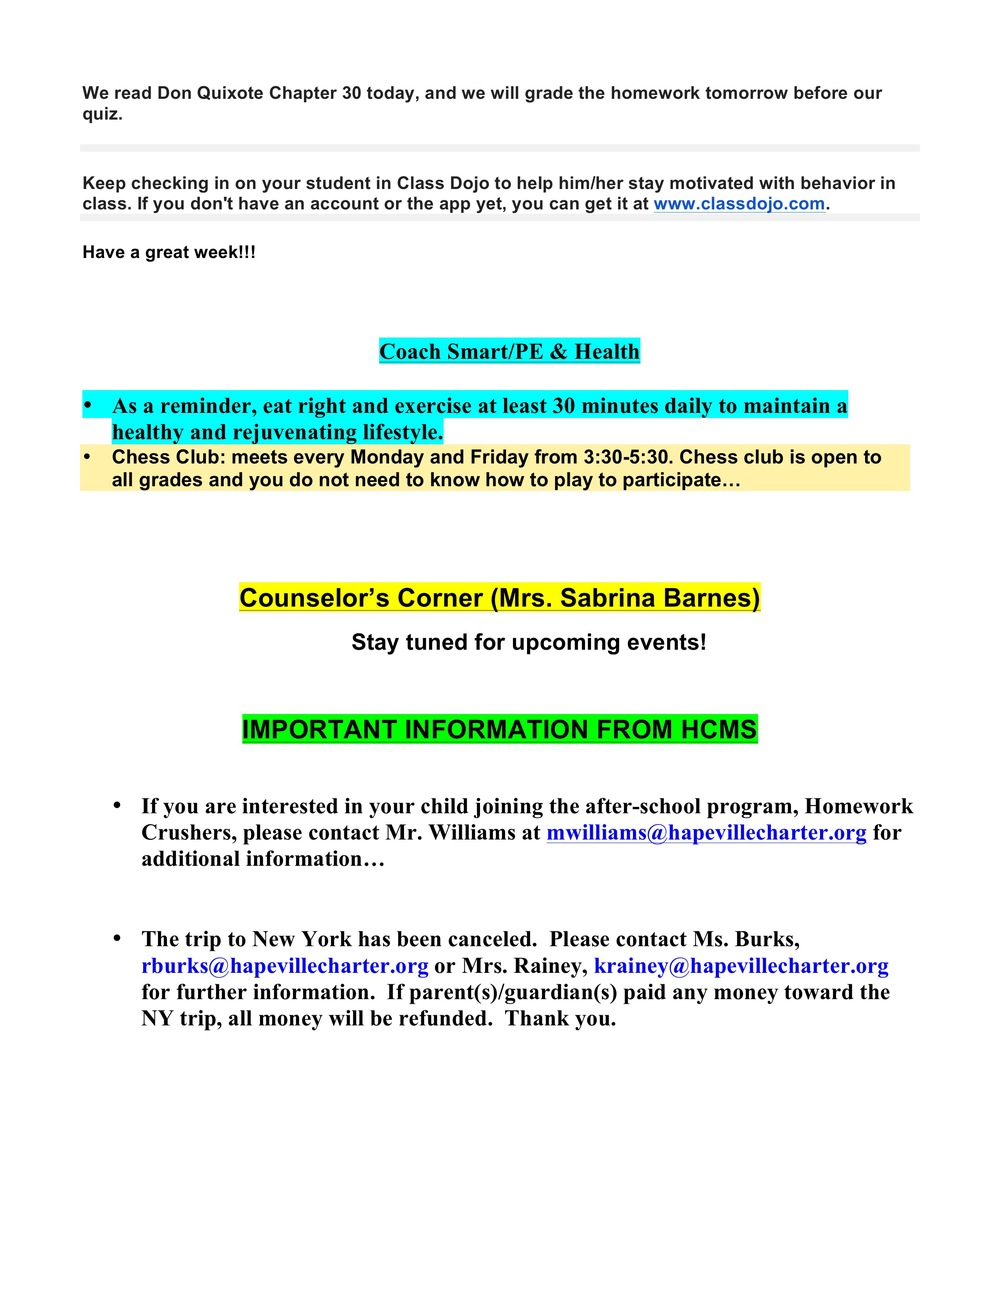 Newsletter Image7th grade 3-2-15 5.jpeg